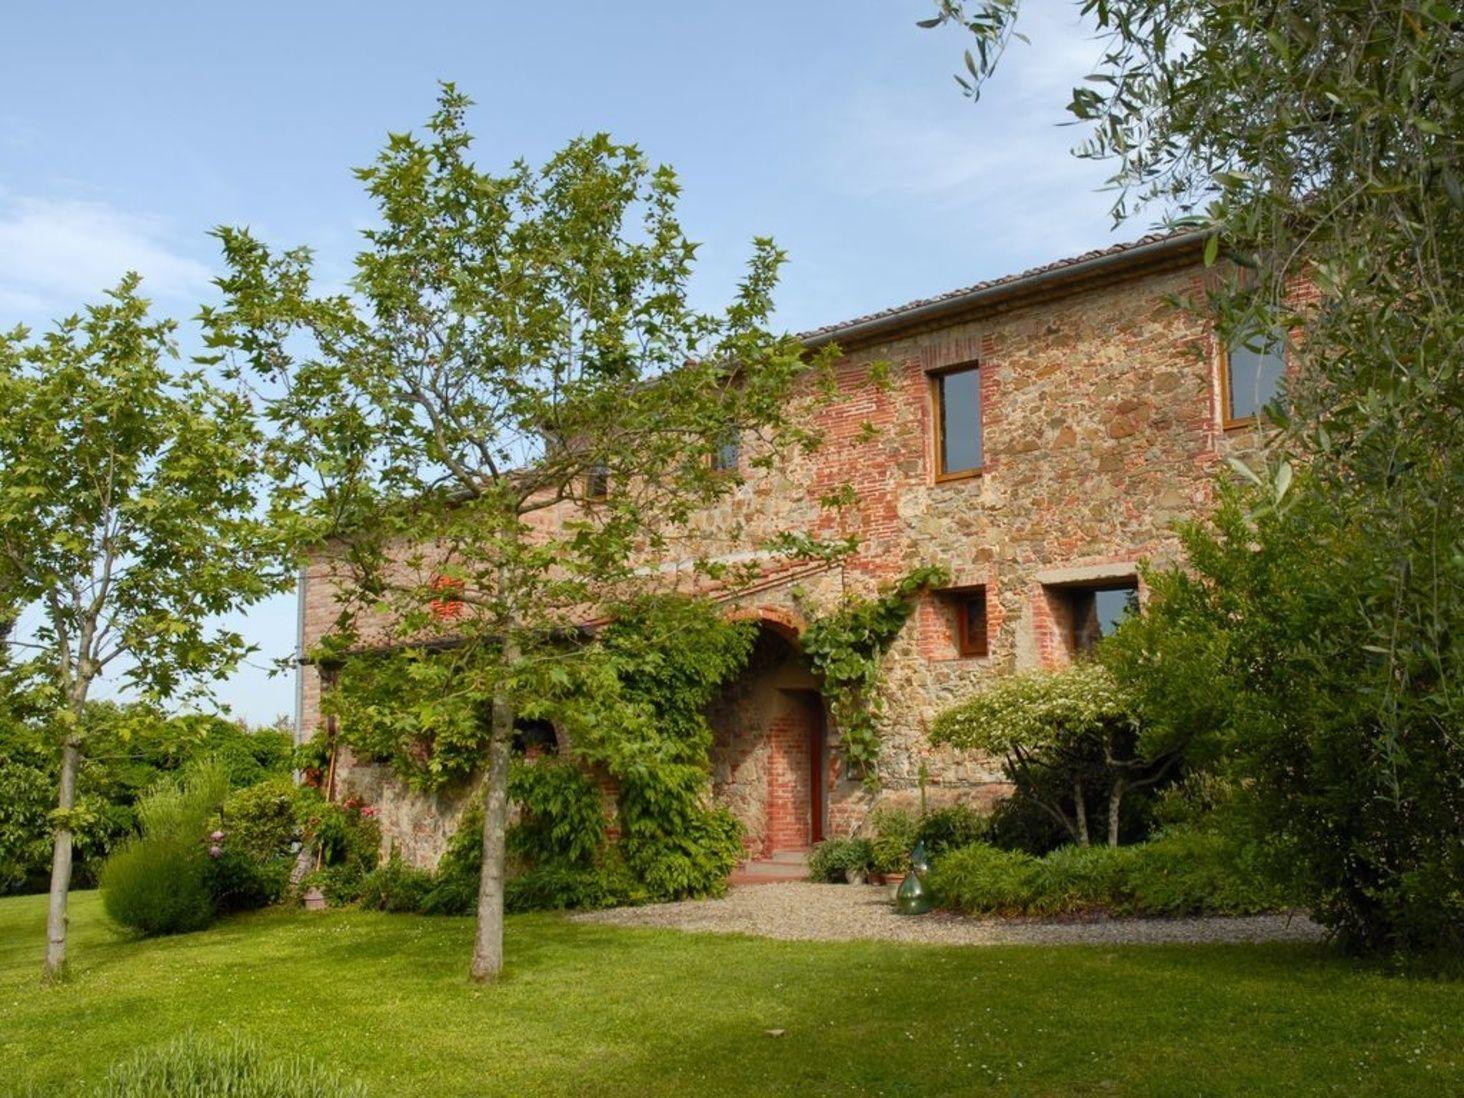 Italien Toskana Immobilie Sinalunga 9 Hektare Mit Wald Olivenbaume Landhaus Mit B B Pool Alleinlage Kaufpreis Reduziert House Styles Property House